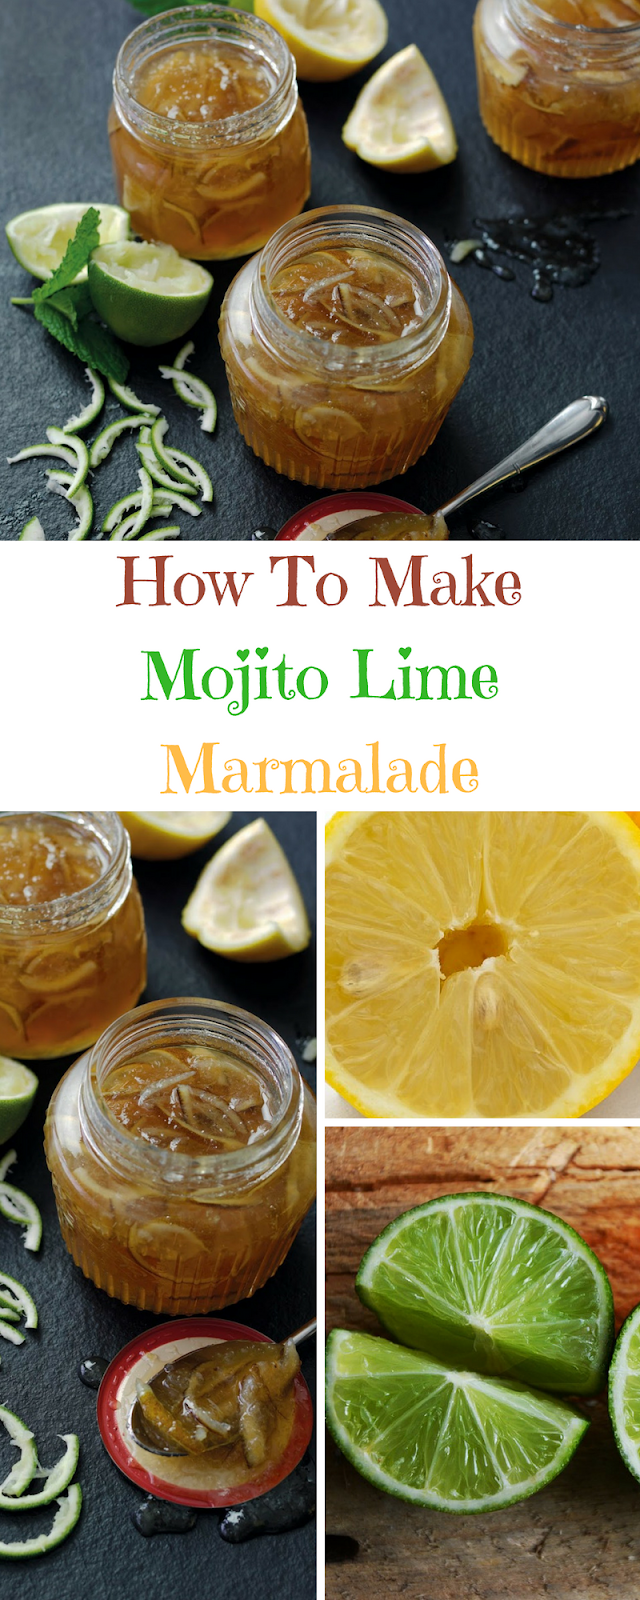 Mojito Lime Marmalade